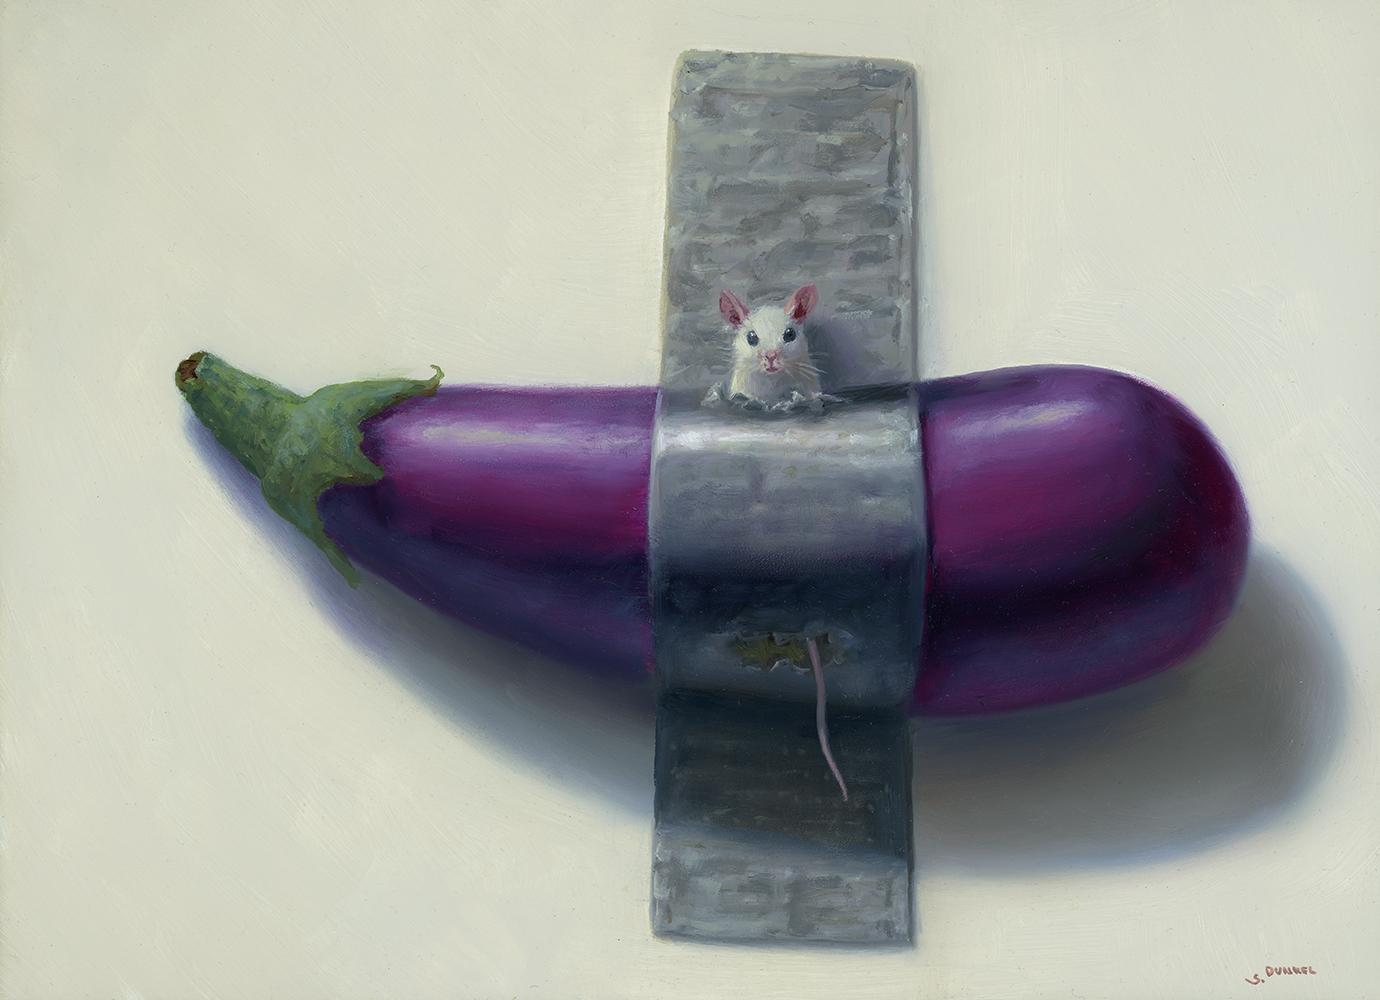 stuart_dunkel_sd1272_top_eggplant.jpg